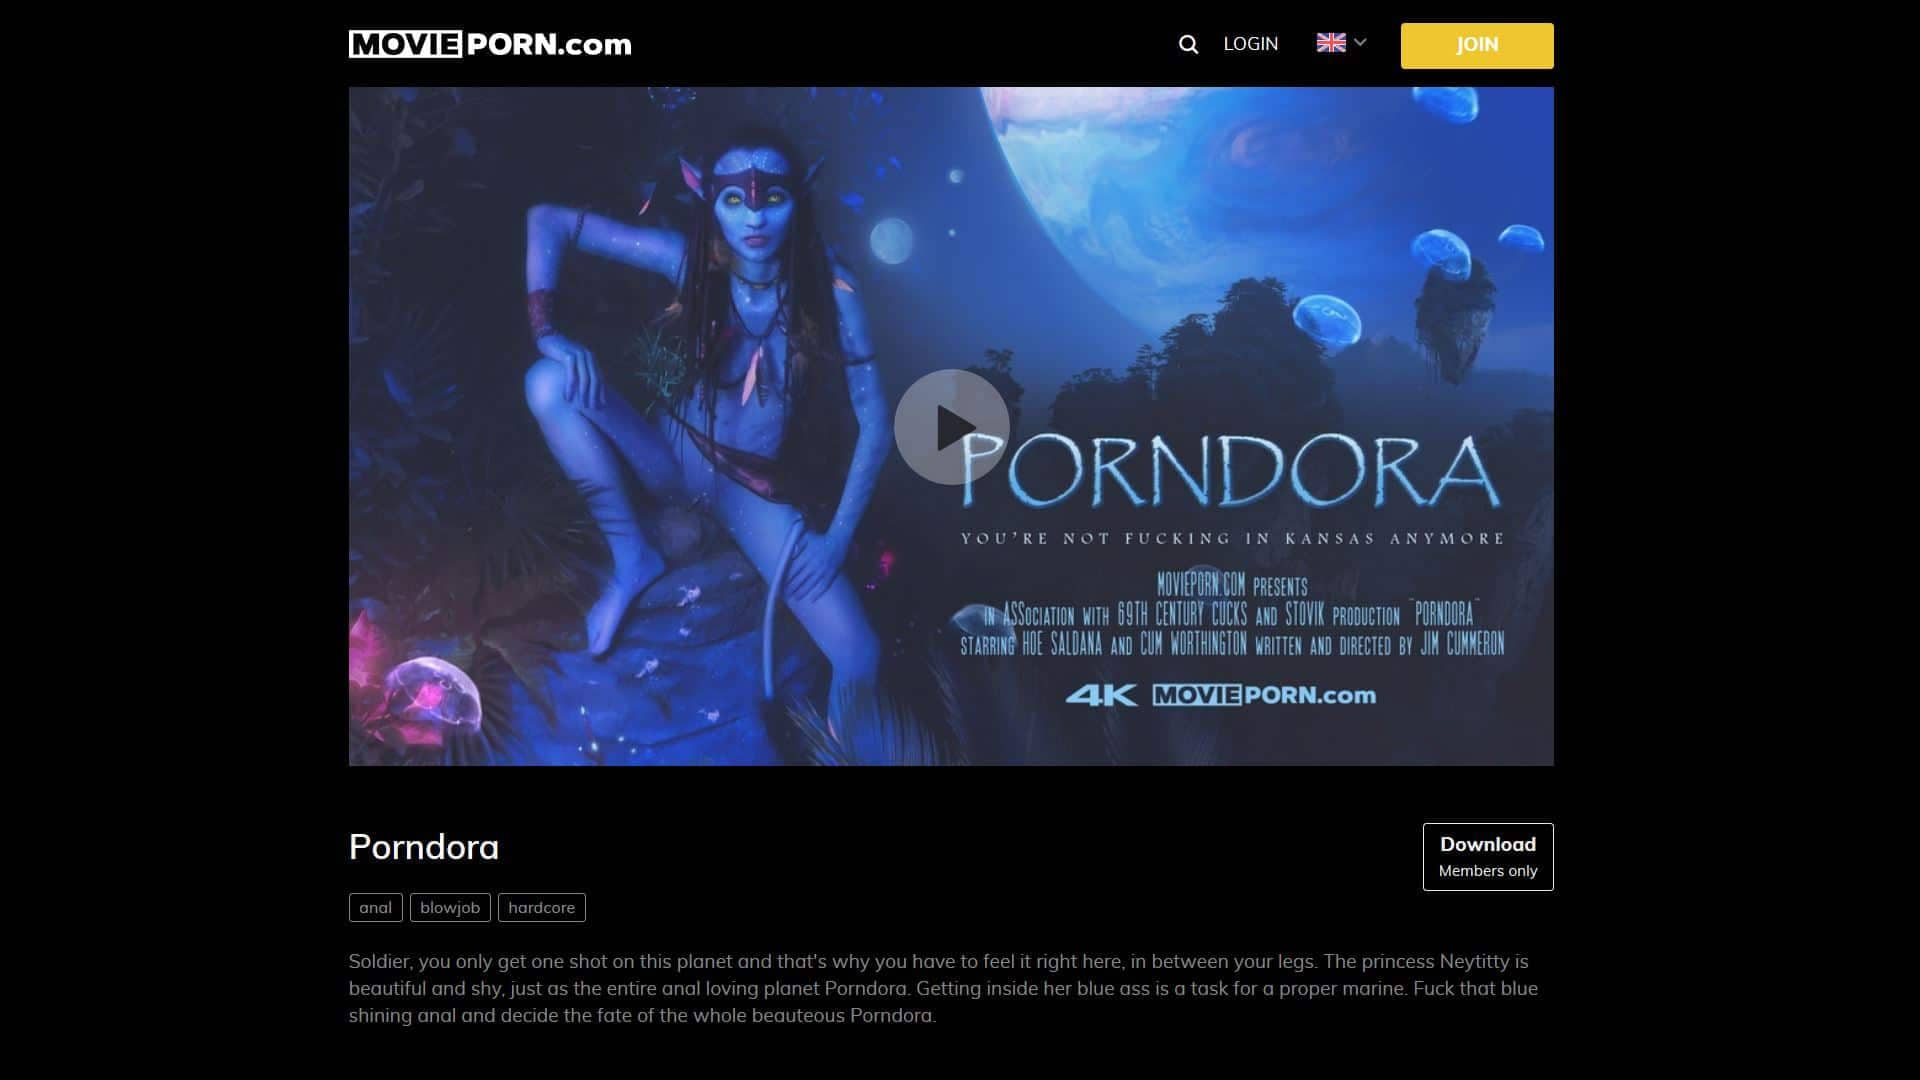 MoviePorn Porndora